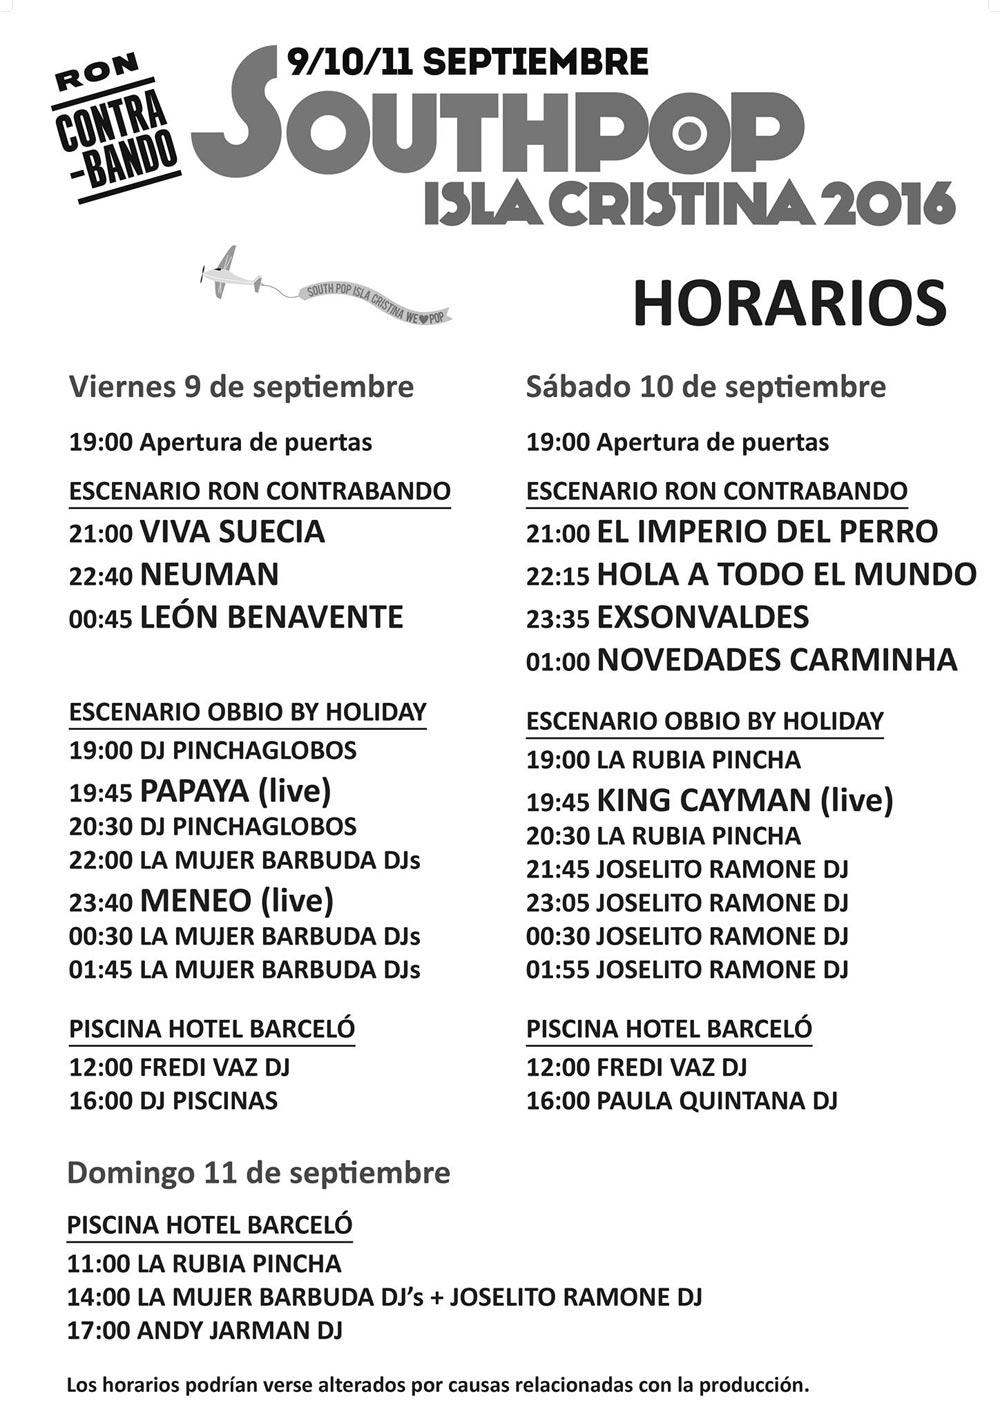 Horarios del South Pop Isla Cristina 2016